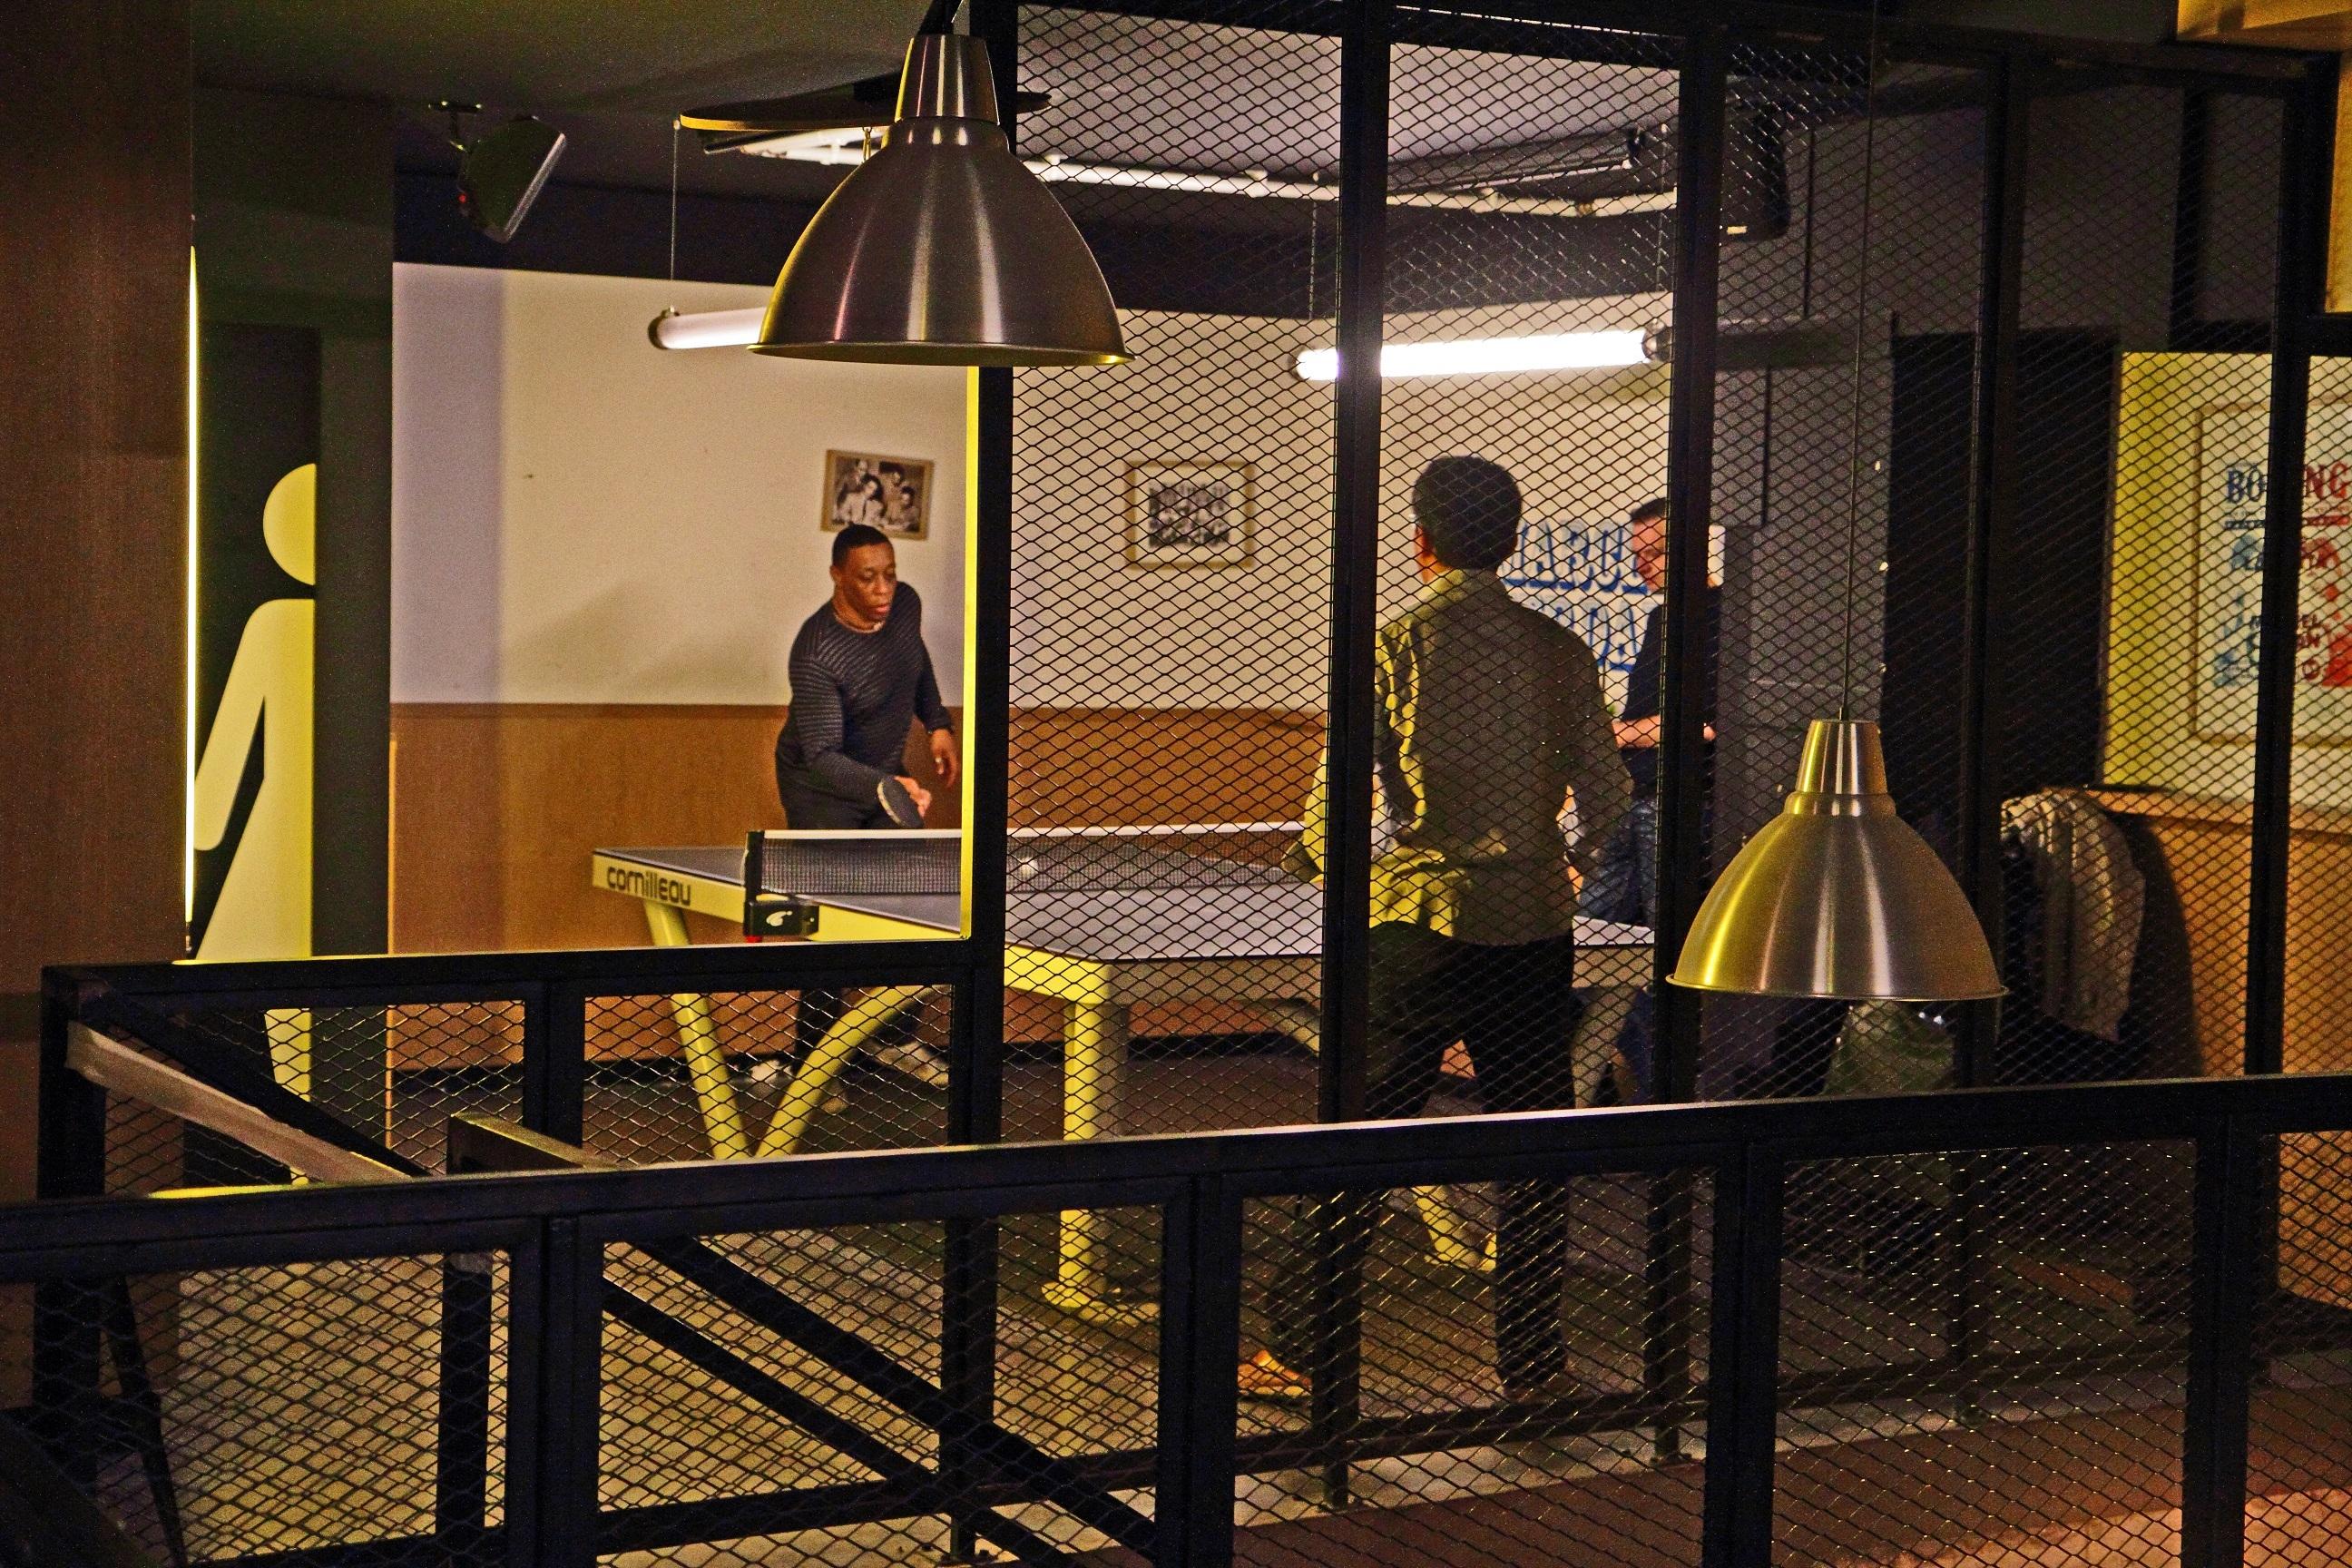 Meilleur bar concept : Le Gossima Ping-pong bar